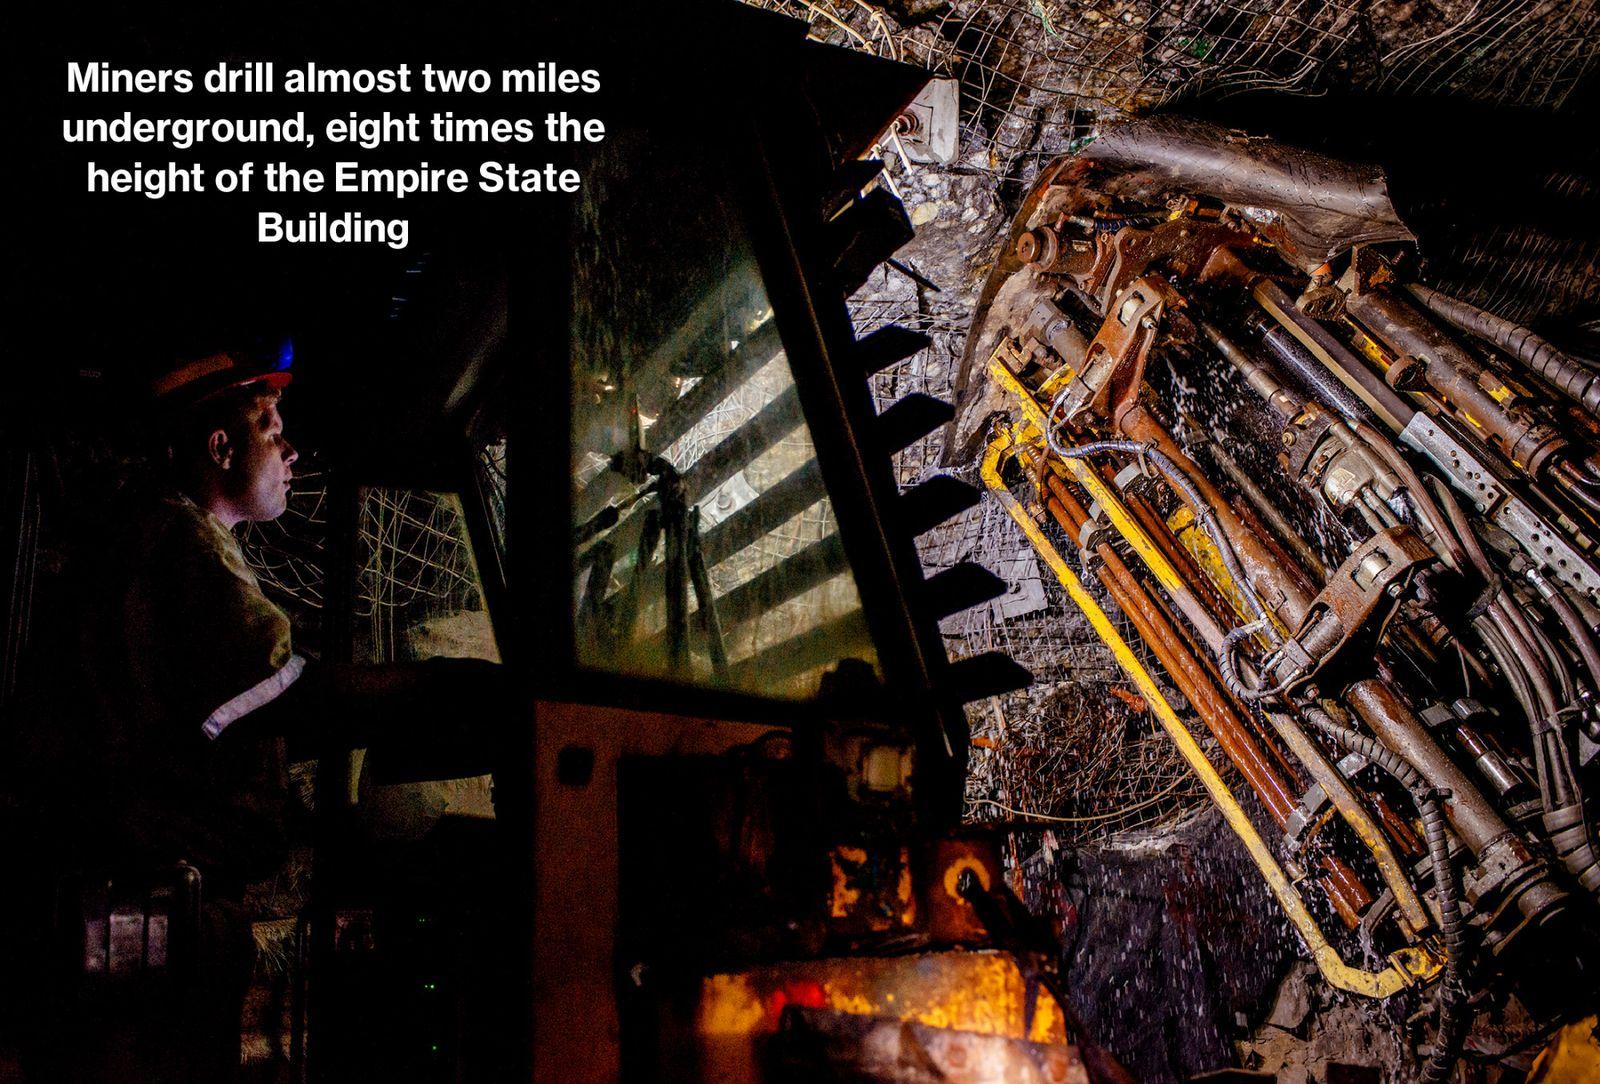 Rocky Wyngaard在South Deep金矿隧道钻洞,用于固定铁丝网以防止落下的岩石。岩面上的洞里充满了爆炸物,将矿石破碎成碎石,然后通过自卸卡车、滑槽与升降机将其运送到地面。